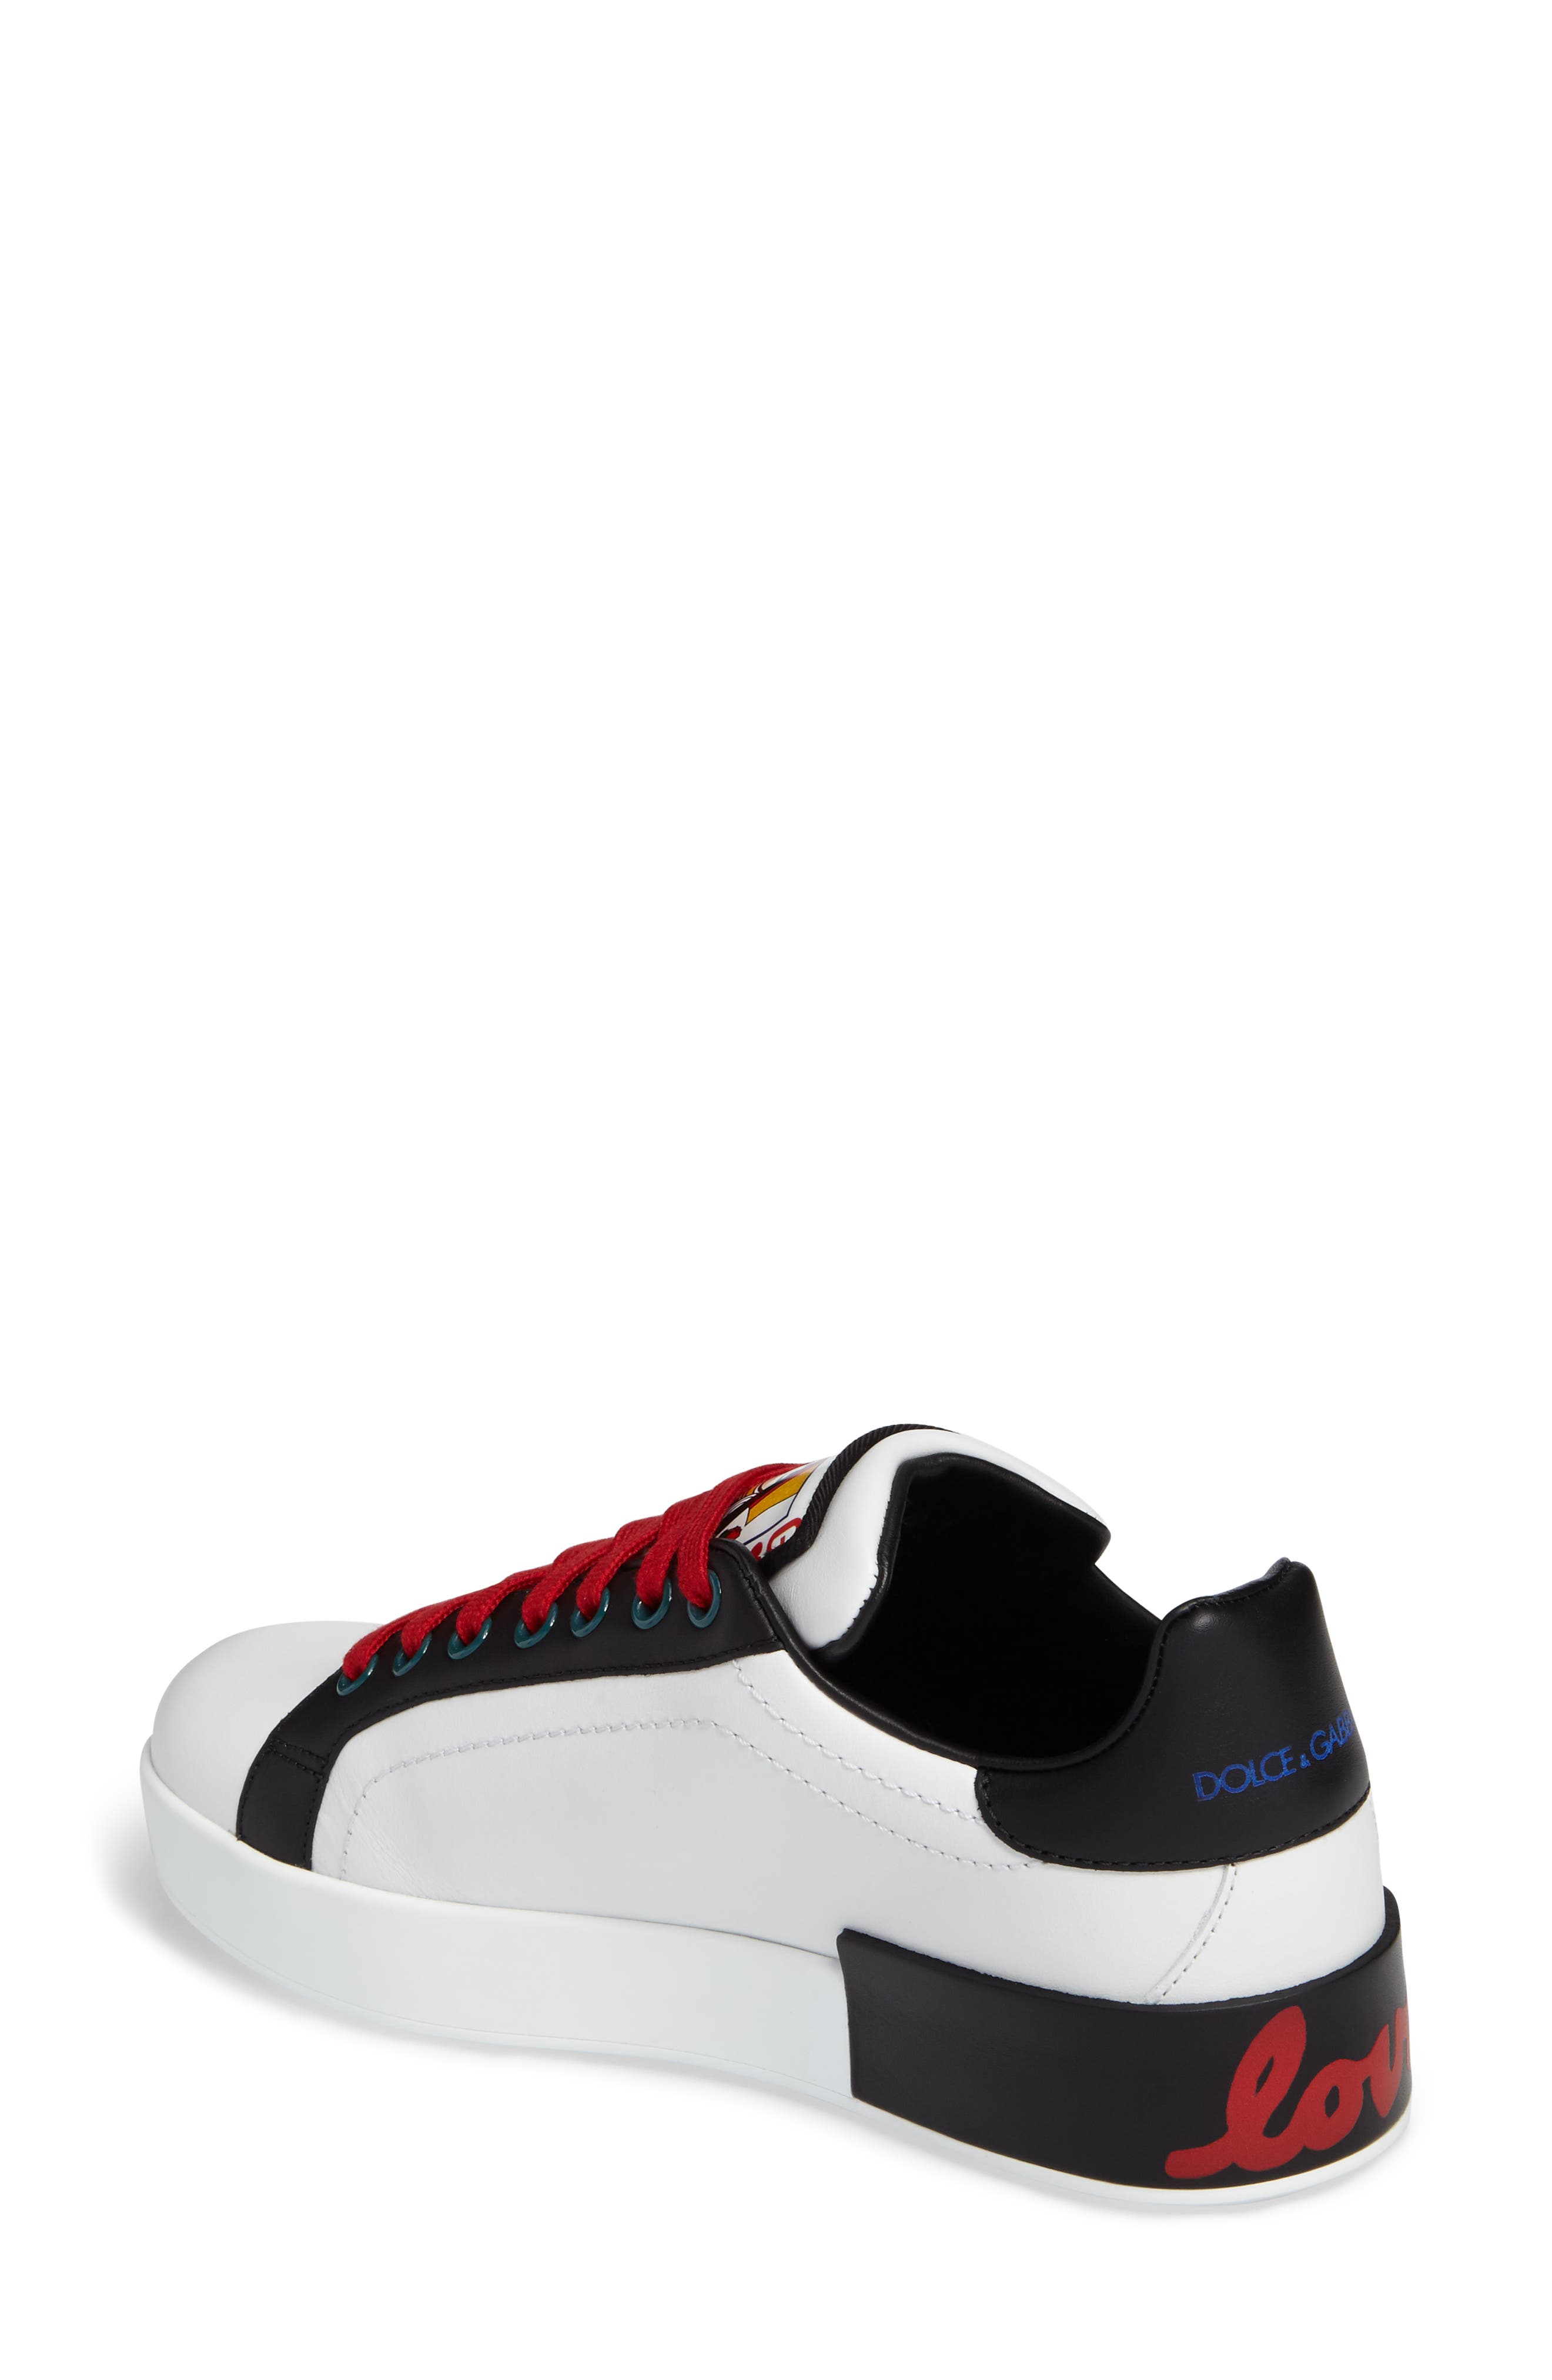 Alternate Image 2  - Dolce&Gabbana Cartoon Sneaker (Women)